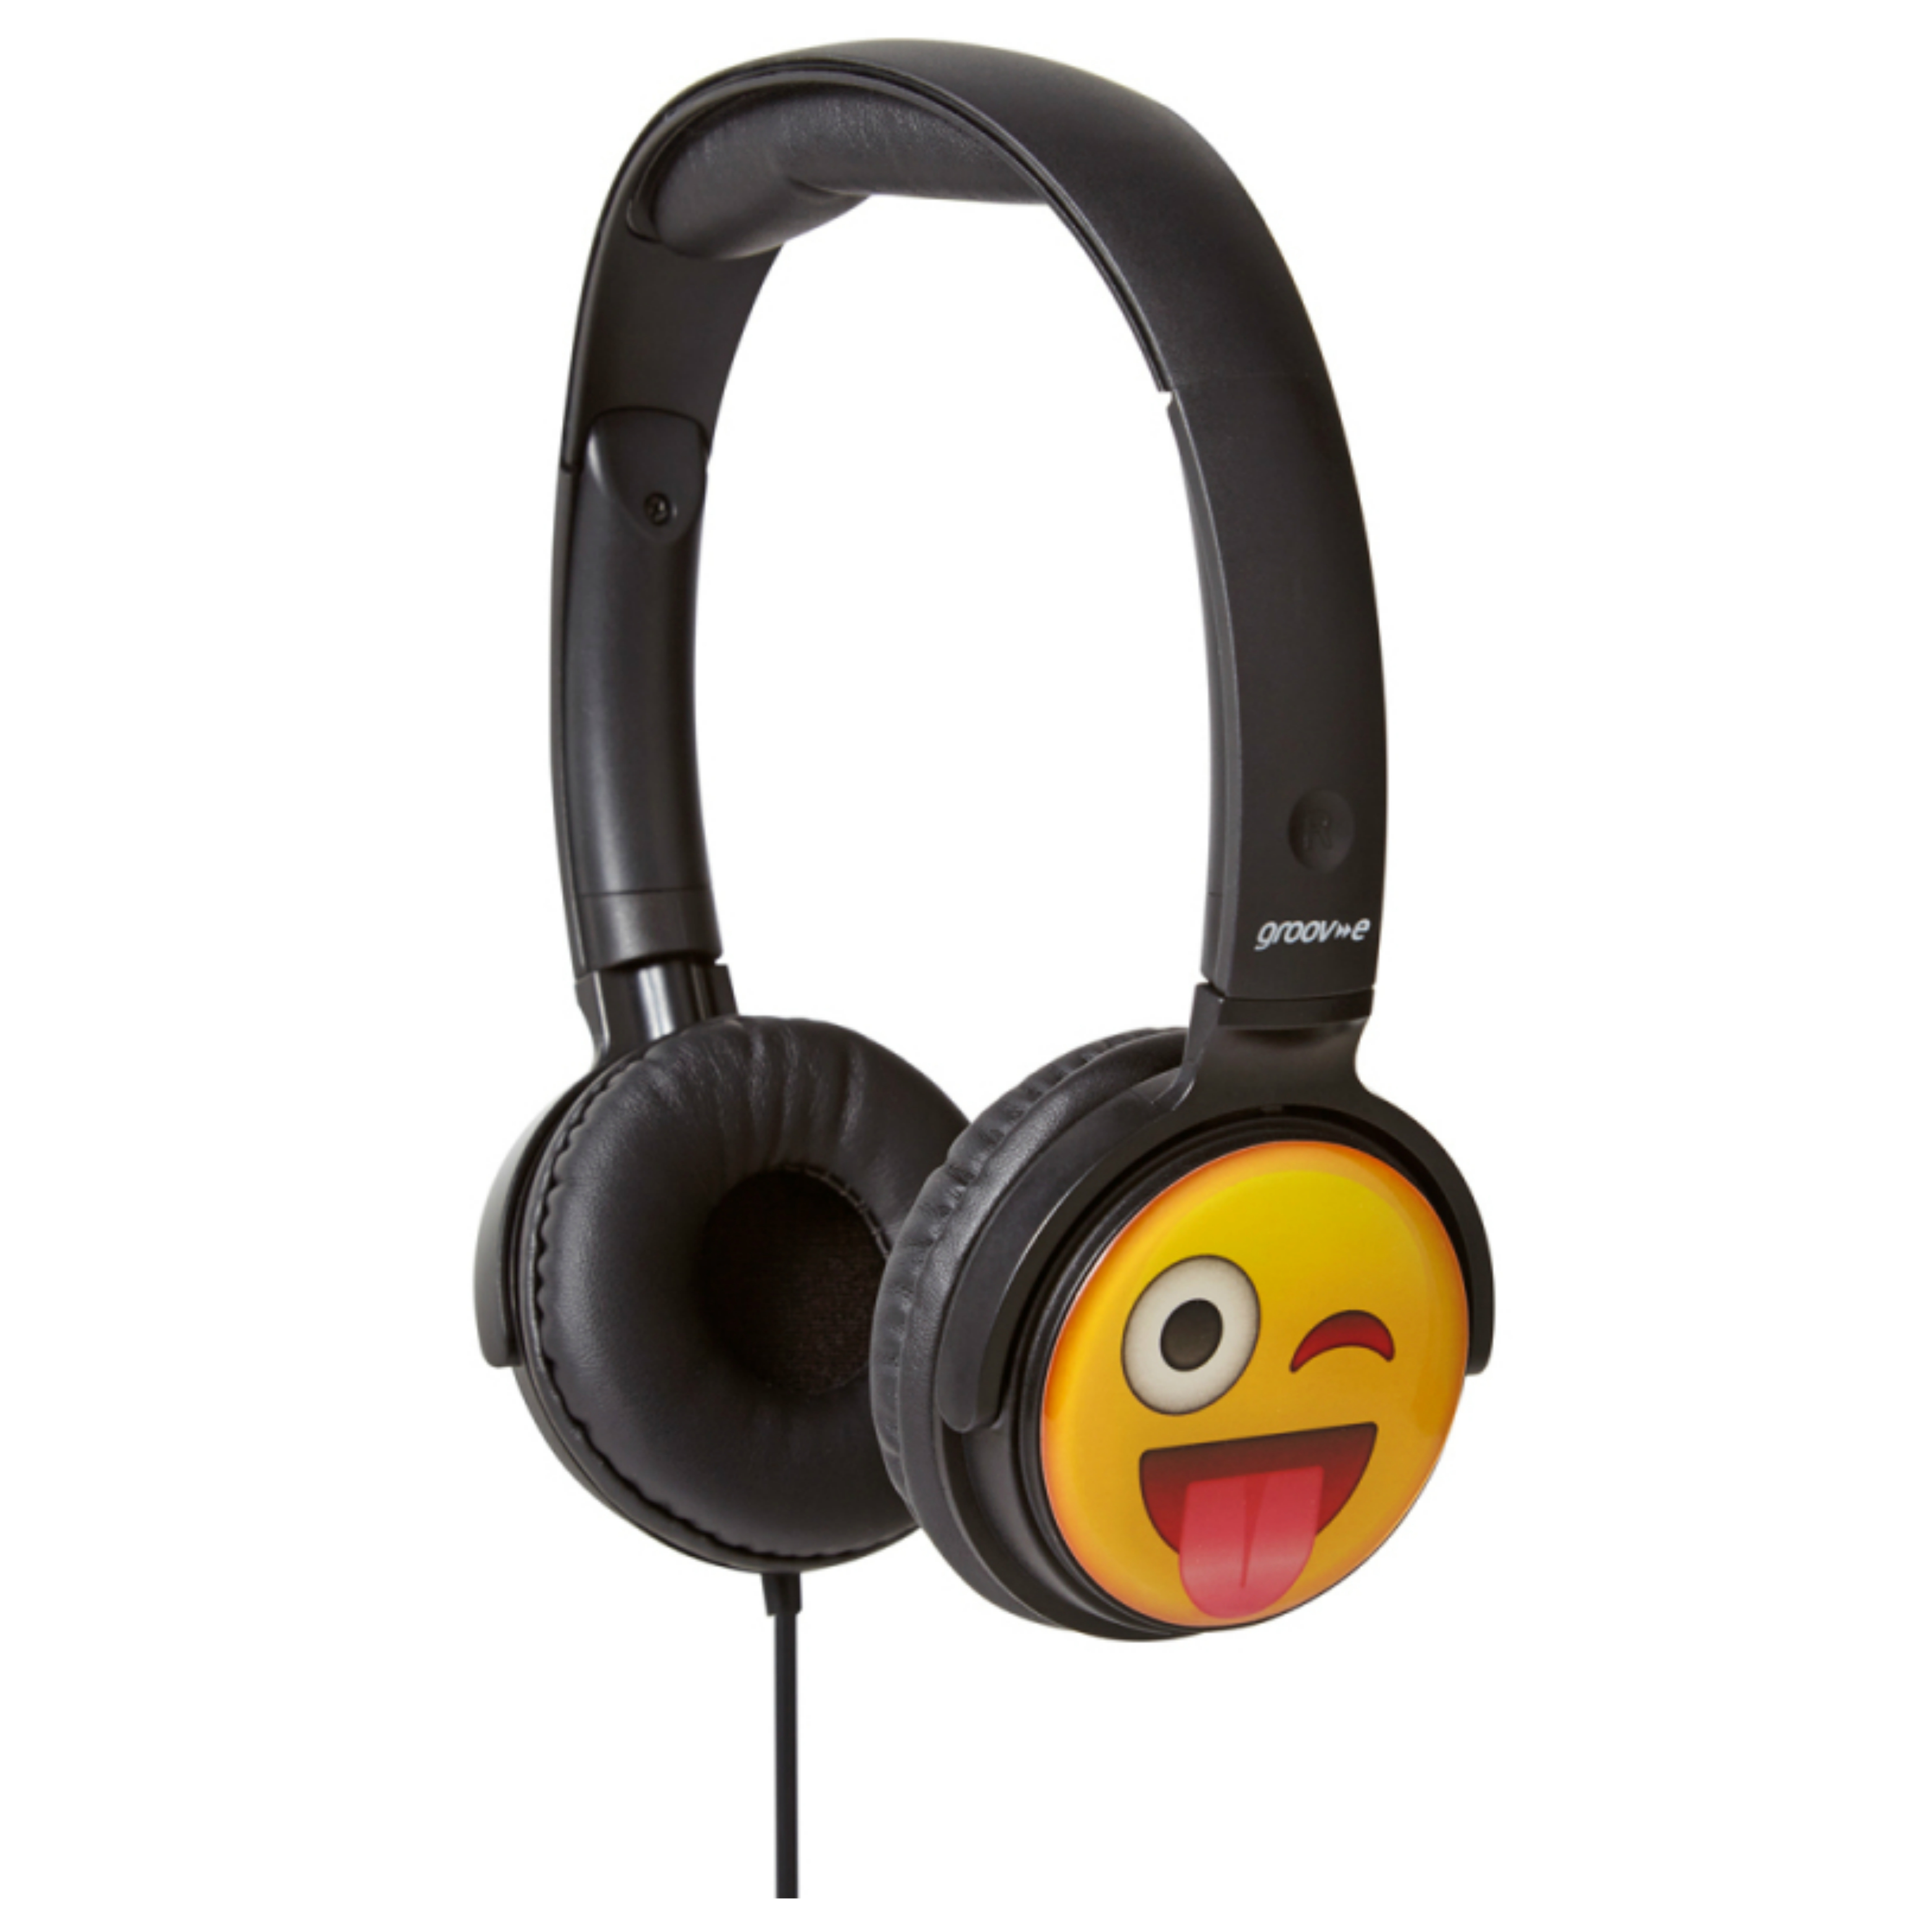 Groov-e GVEMJ11 EarMOJI's Stereo Headphones Ear Cups Headband With Cheeky Face